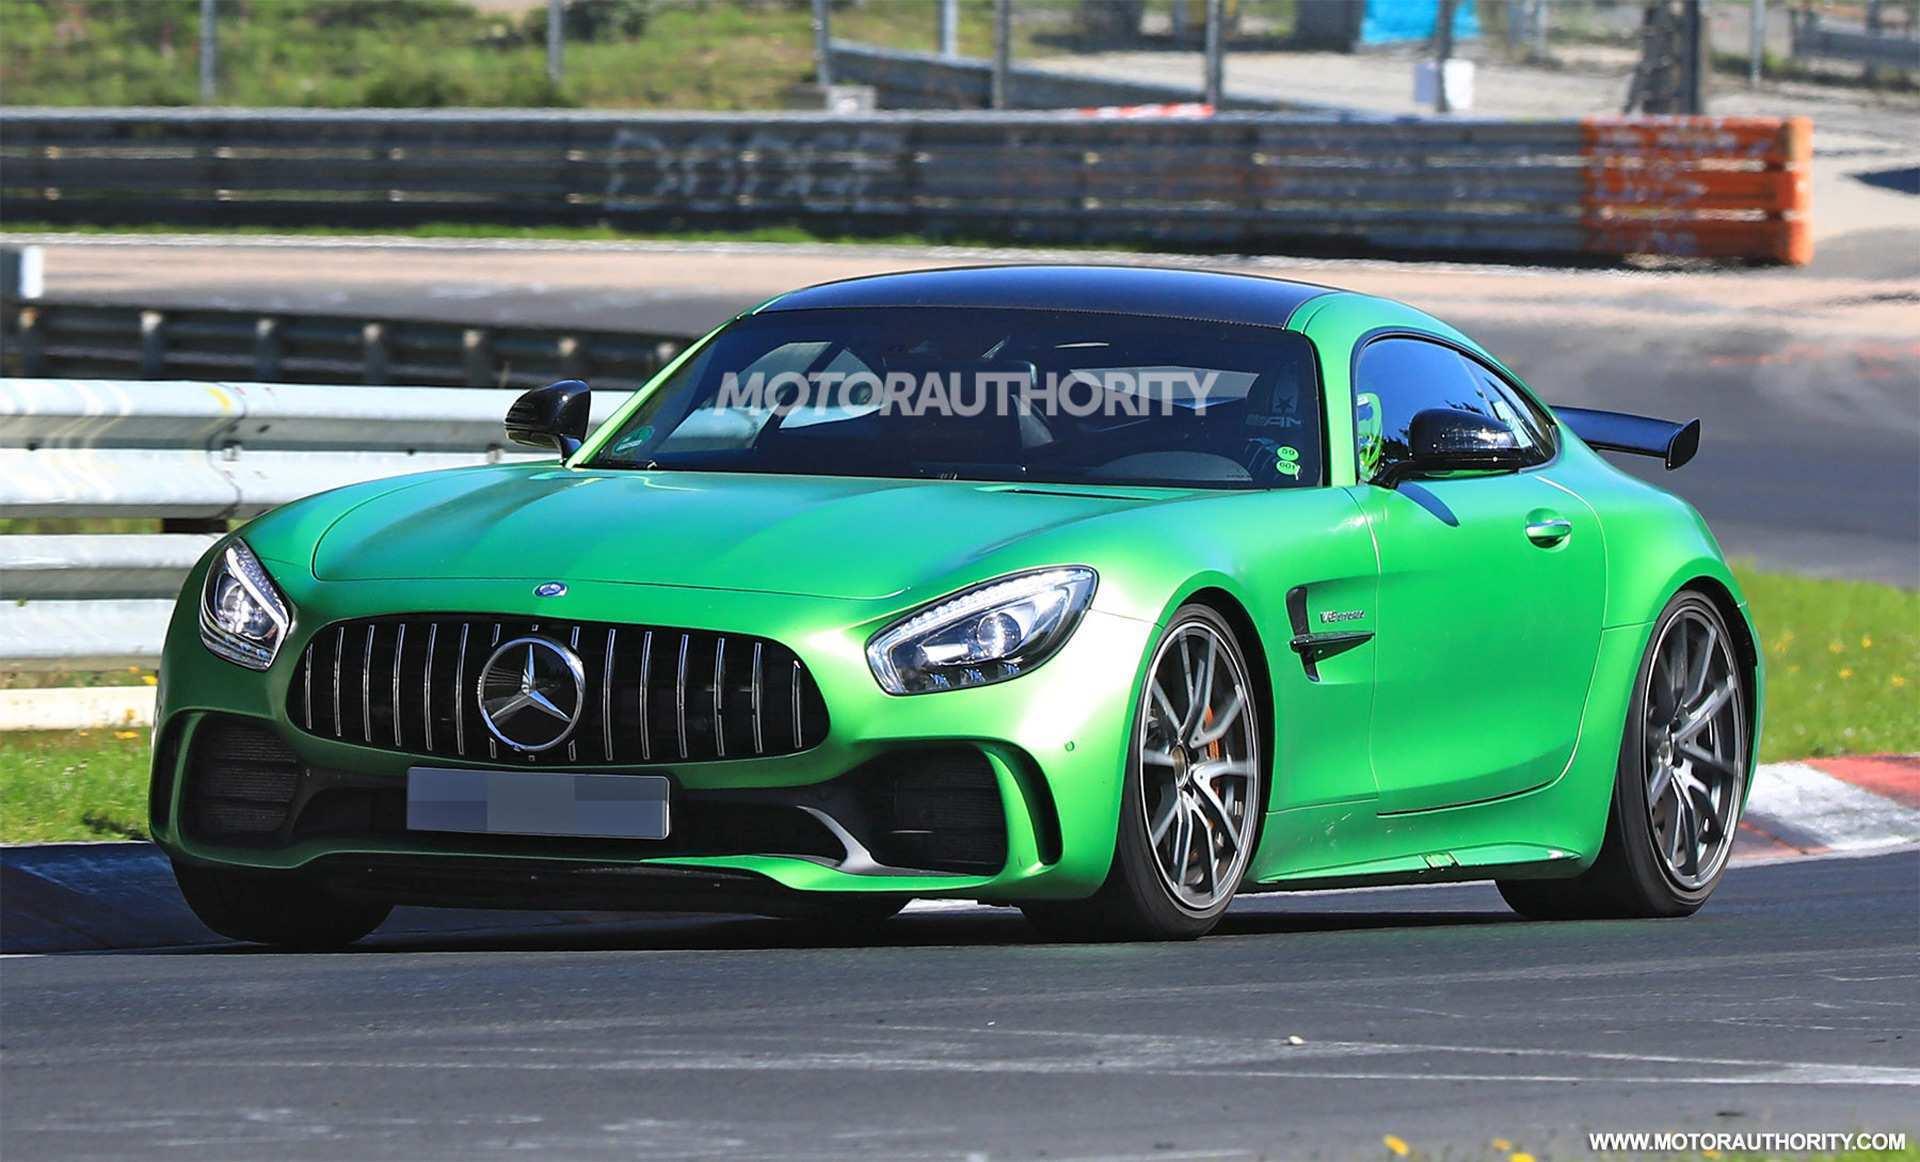 56 Great Mercedes 2019 Sports Car Specs for Mercedes 2019 Sports Car